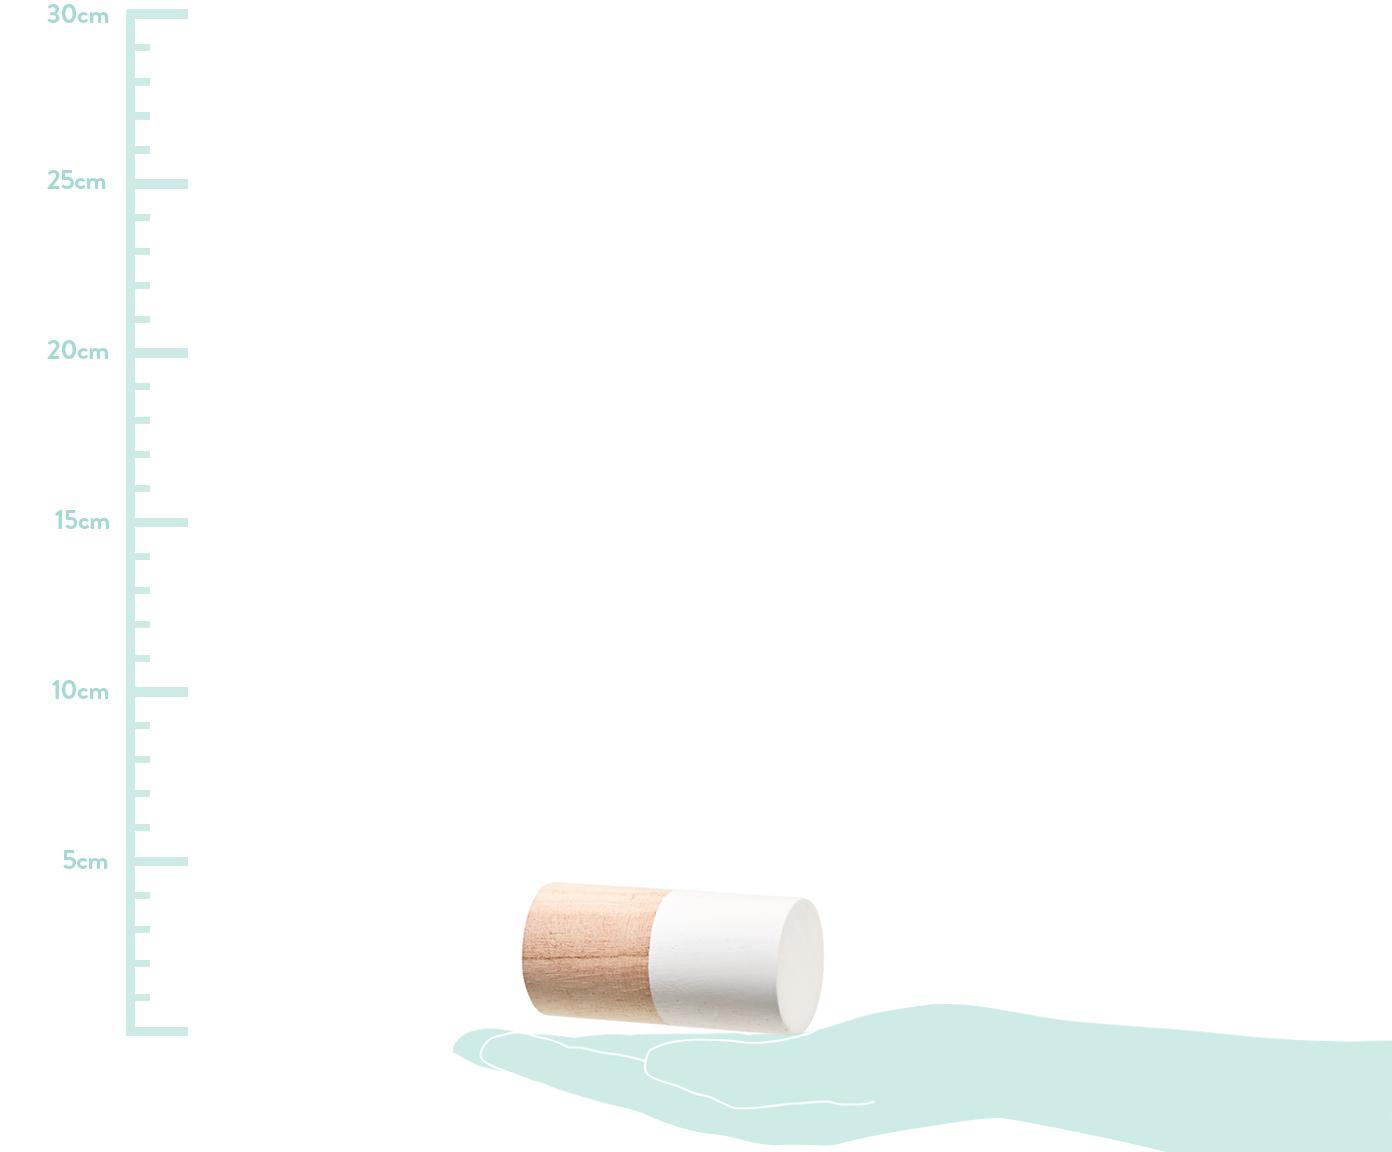 Kleiderhaken-Set Mandi aus Holz, 3-tlg., Paulowniaholz, Braun, Weiß, Rosa, Grau, Ø 4 x T 8 cm